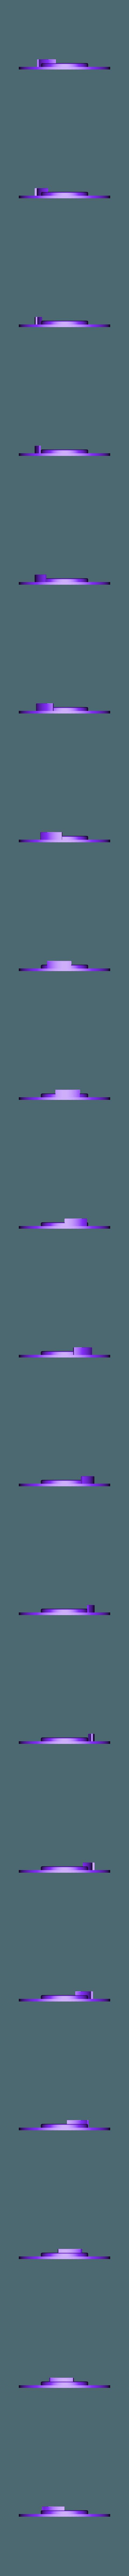 Pièce 12.STL Download STL file Translocator Sombra • 3D print model, Midnight_05